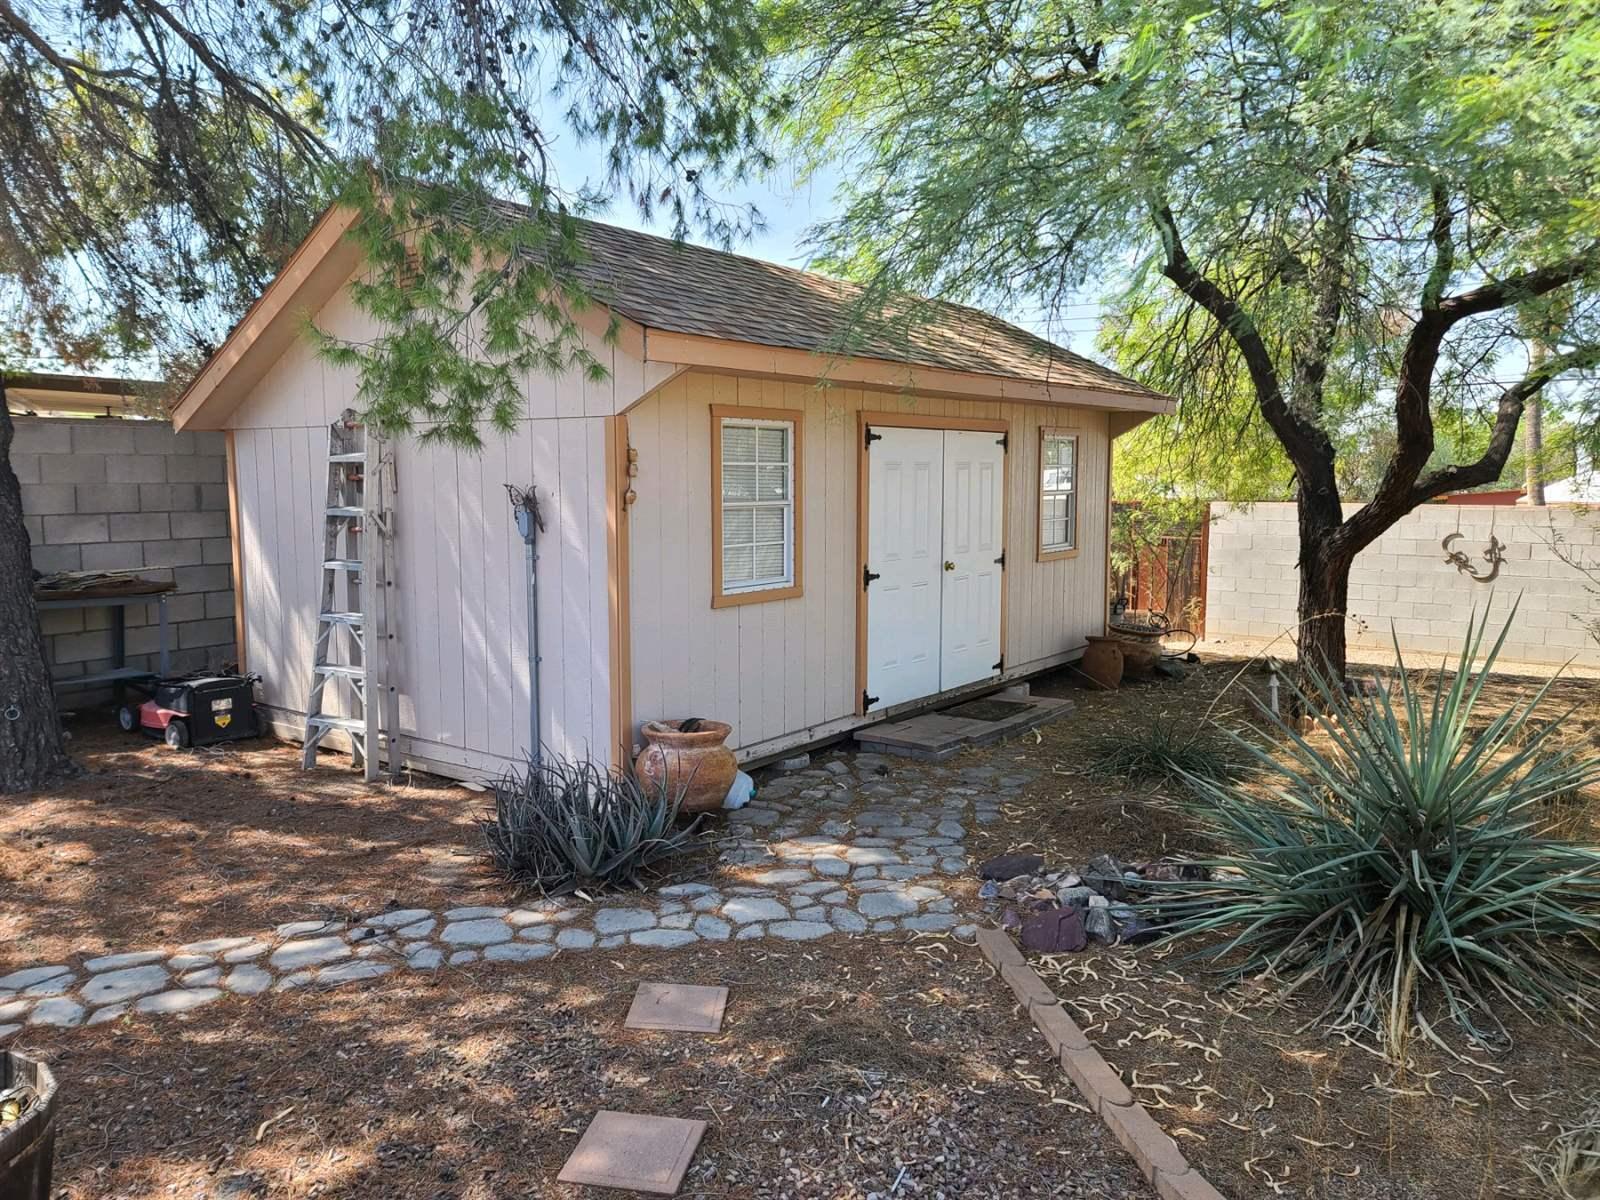 532 S Sherwood Village, Tucson, AZ 85710